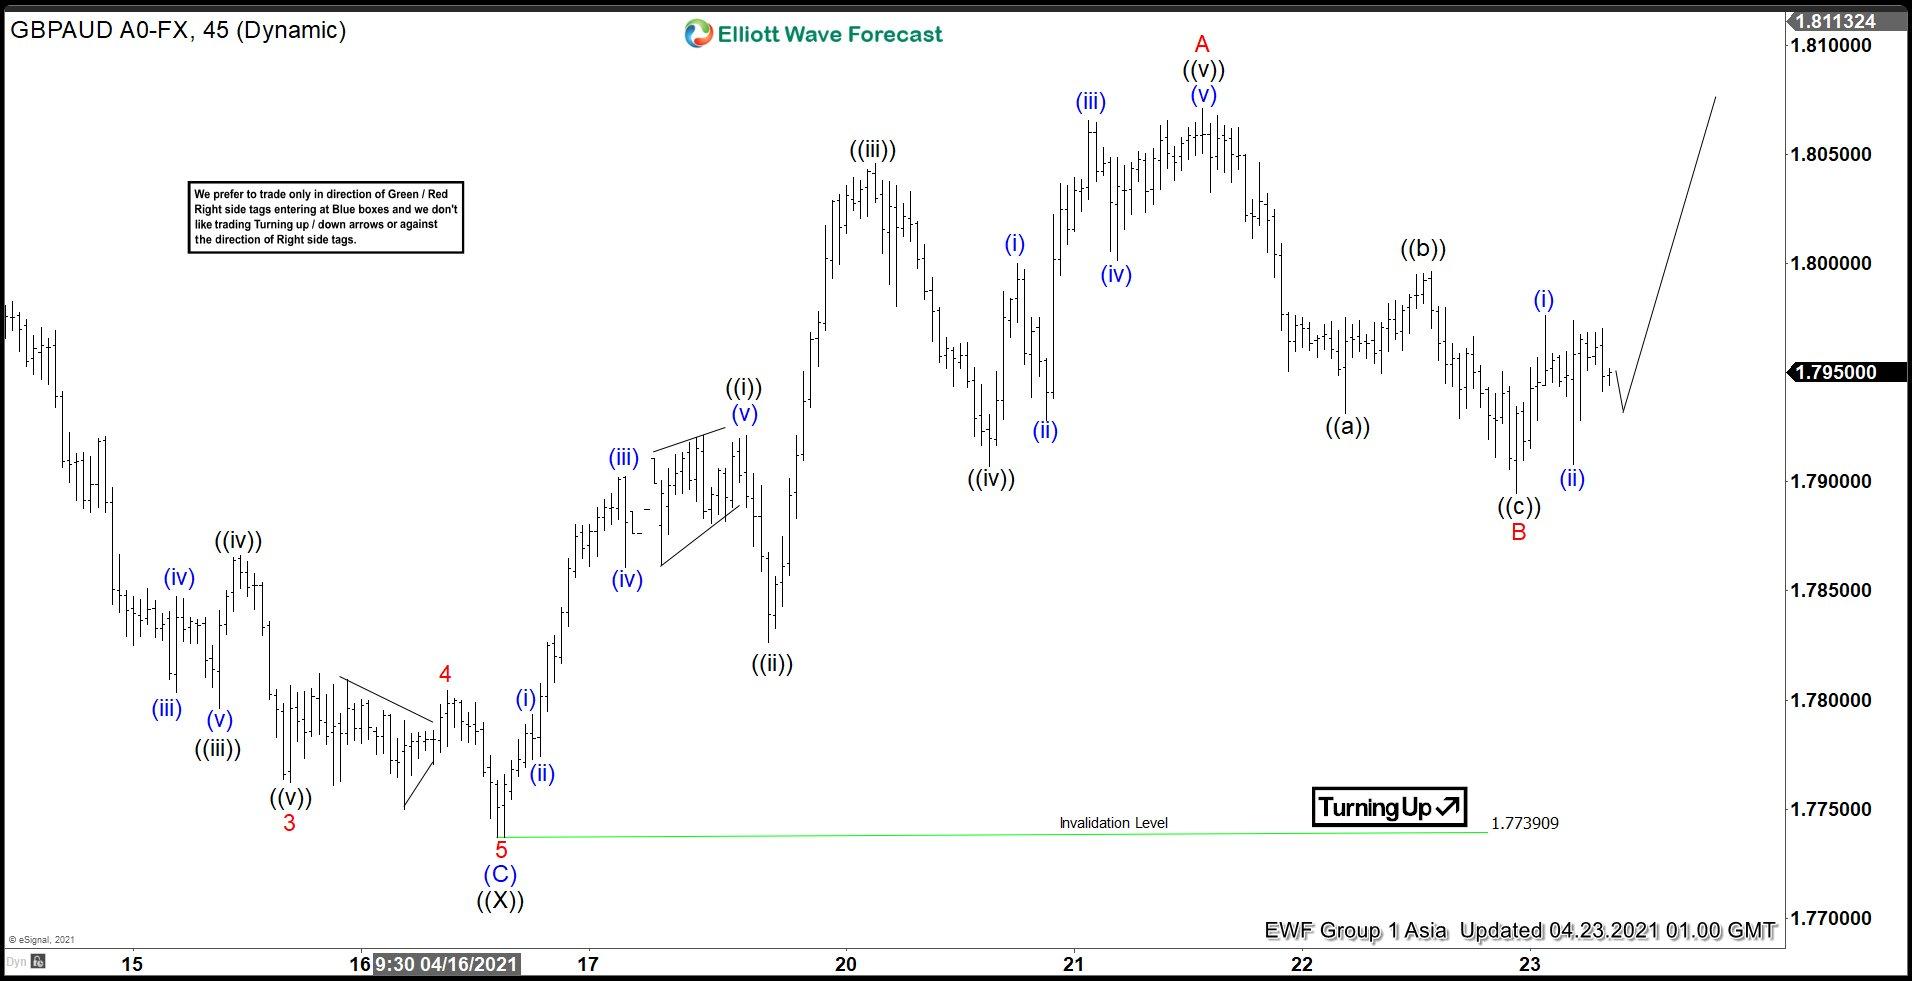 GBPAUD Elliott Wave Chart